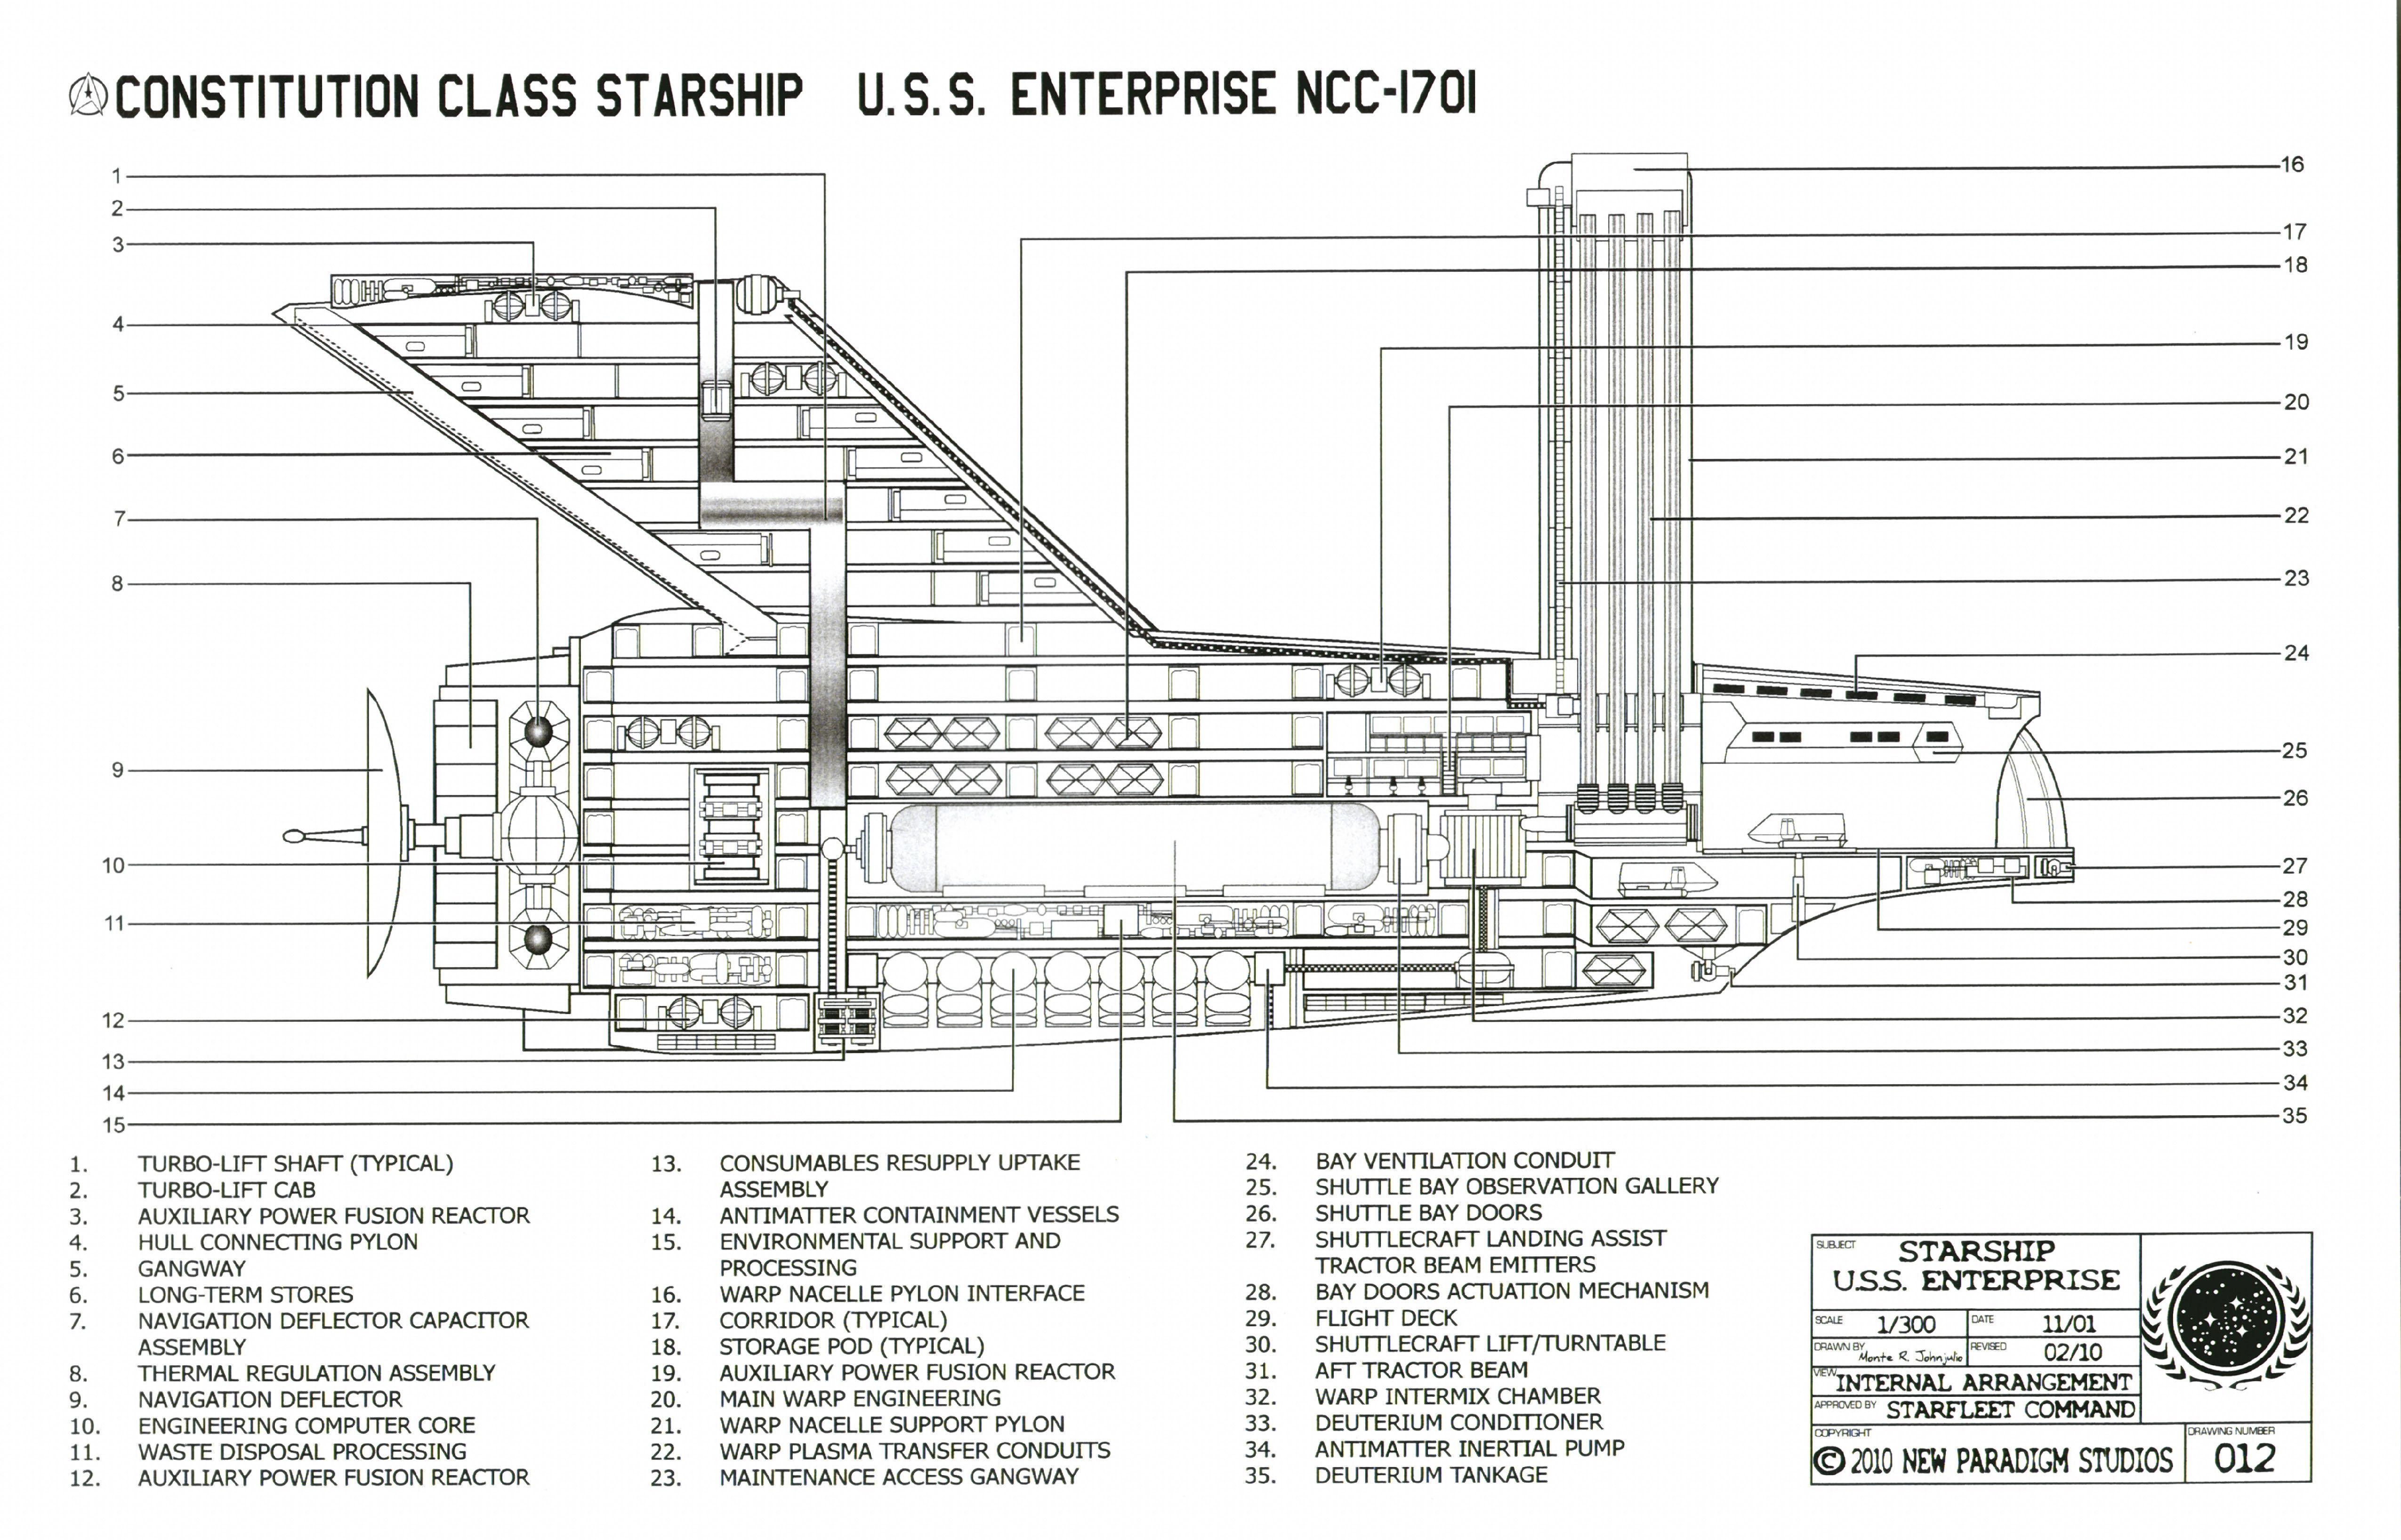 Star Trek Blueprints: Constitution Cl Starship - U.S.S. ...